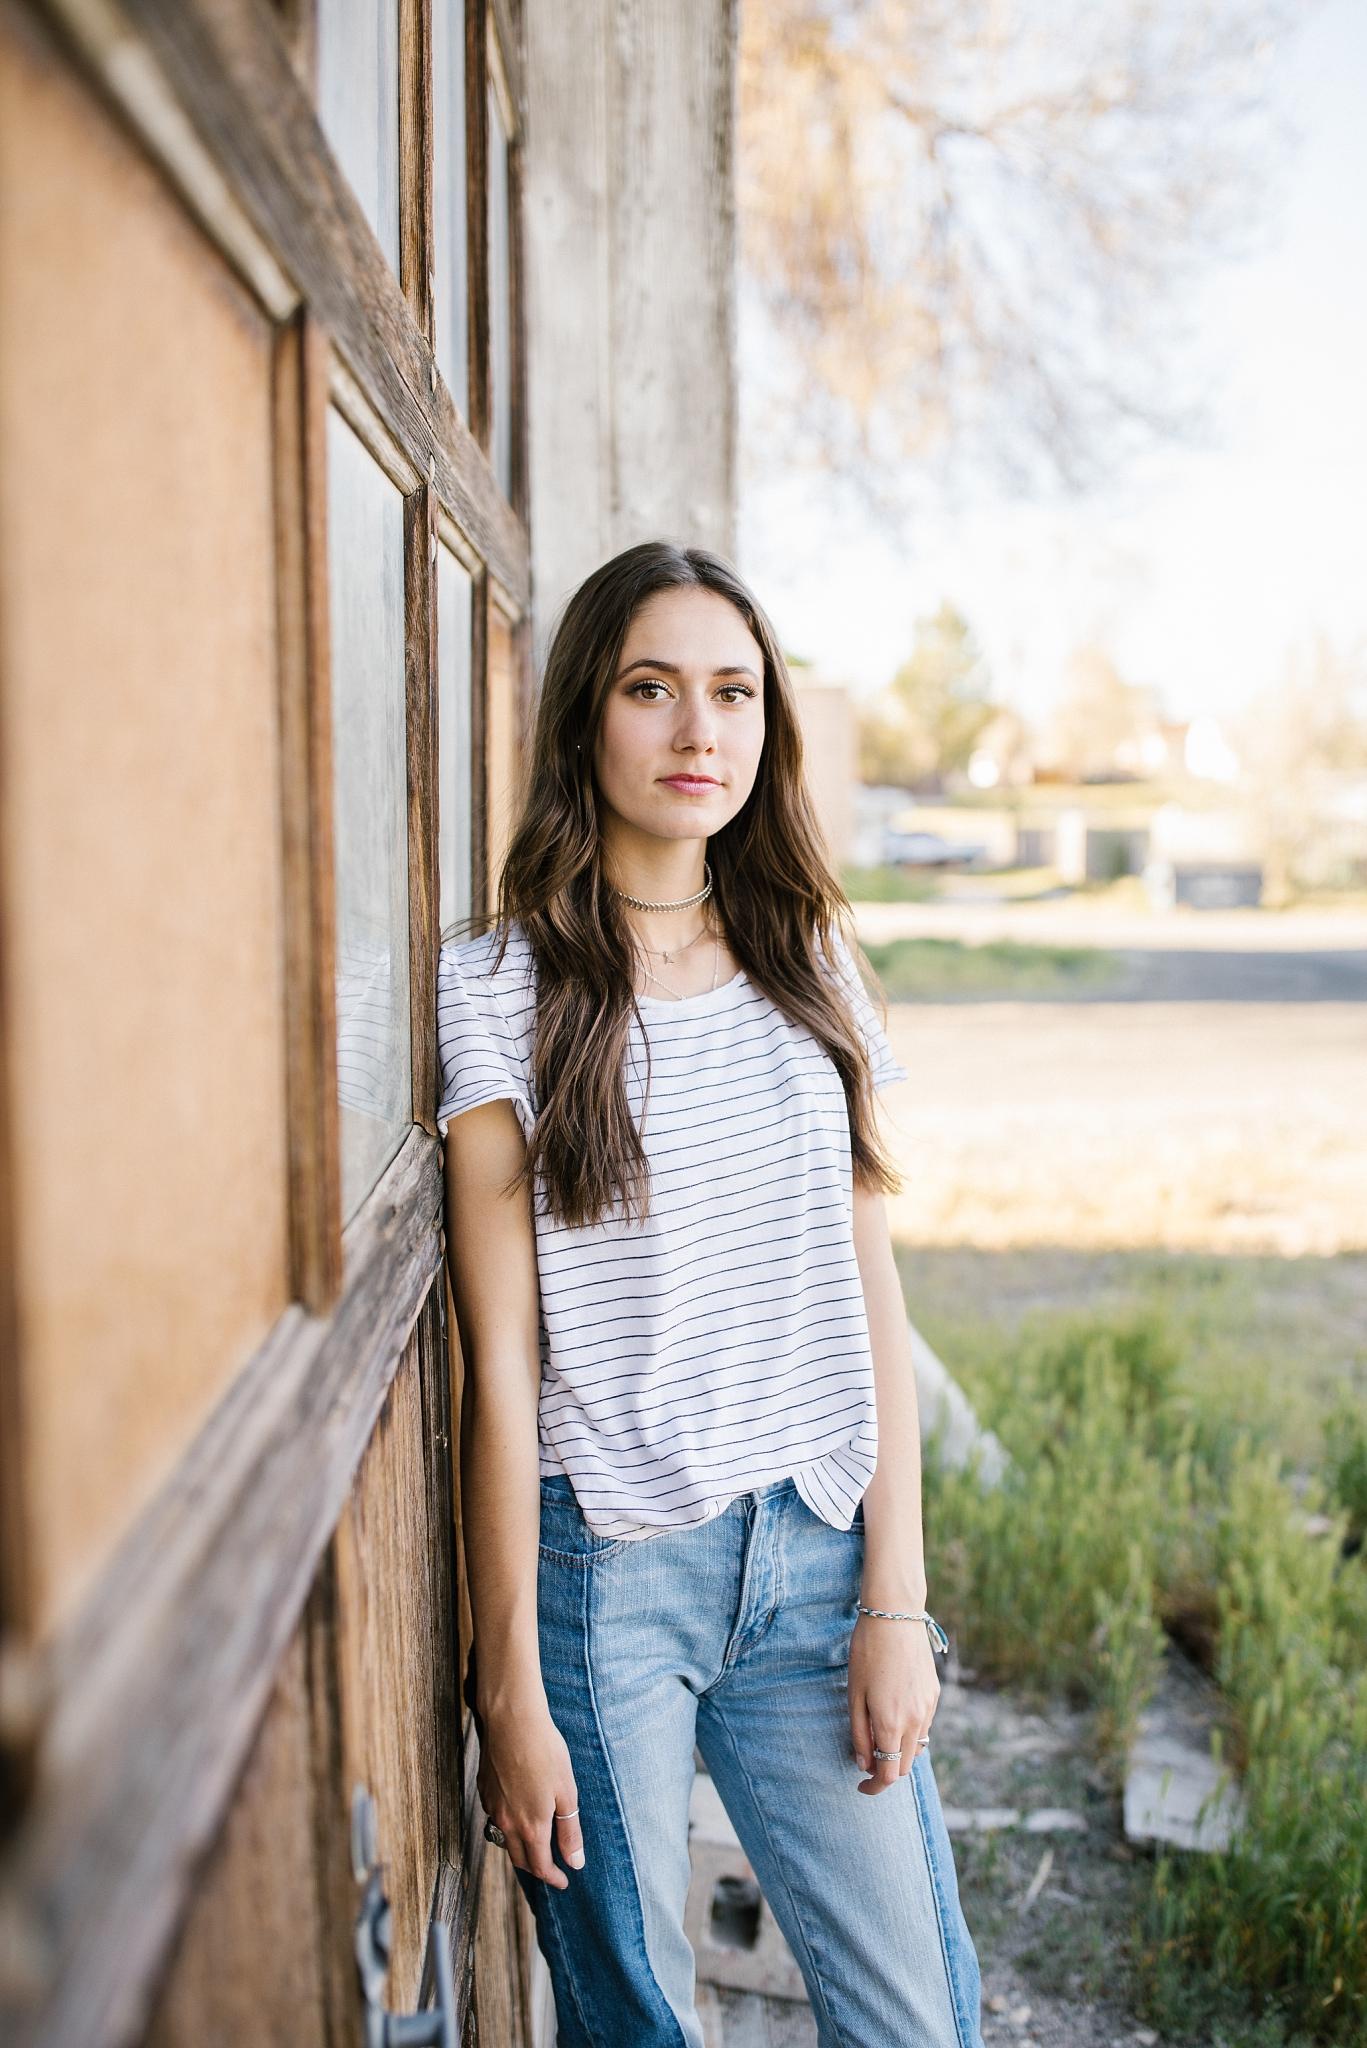 Audrey-81_Lizzie-B-Imagery-Utah-Family-Photographer-Central-Utah-Senior-Photography.jpg